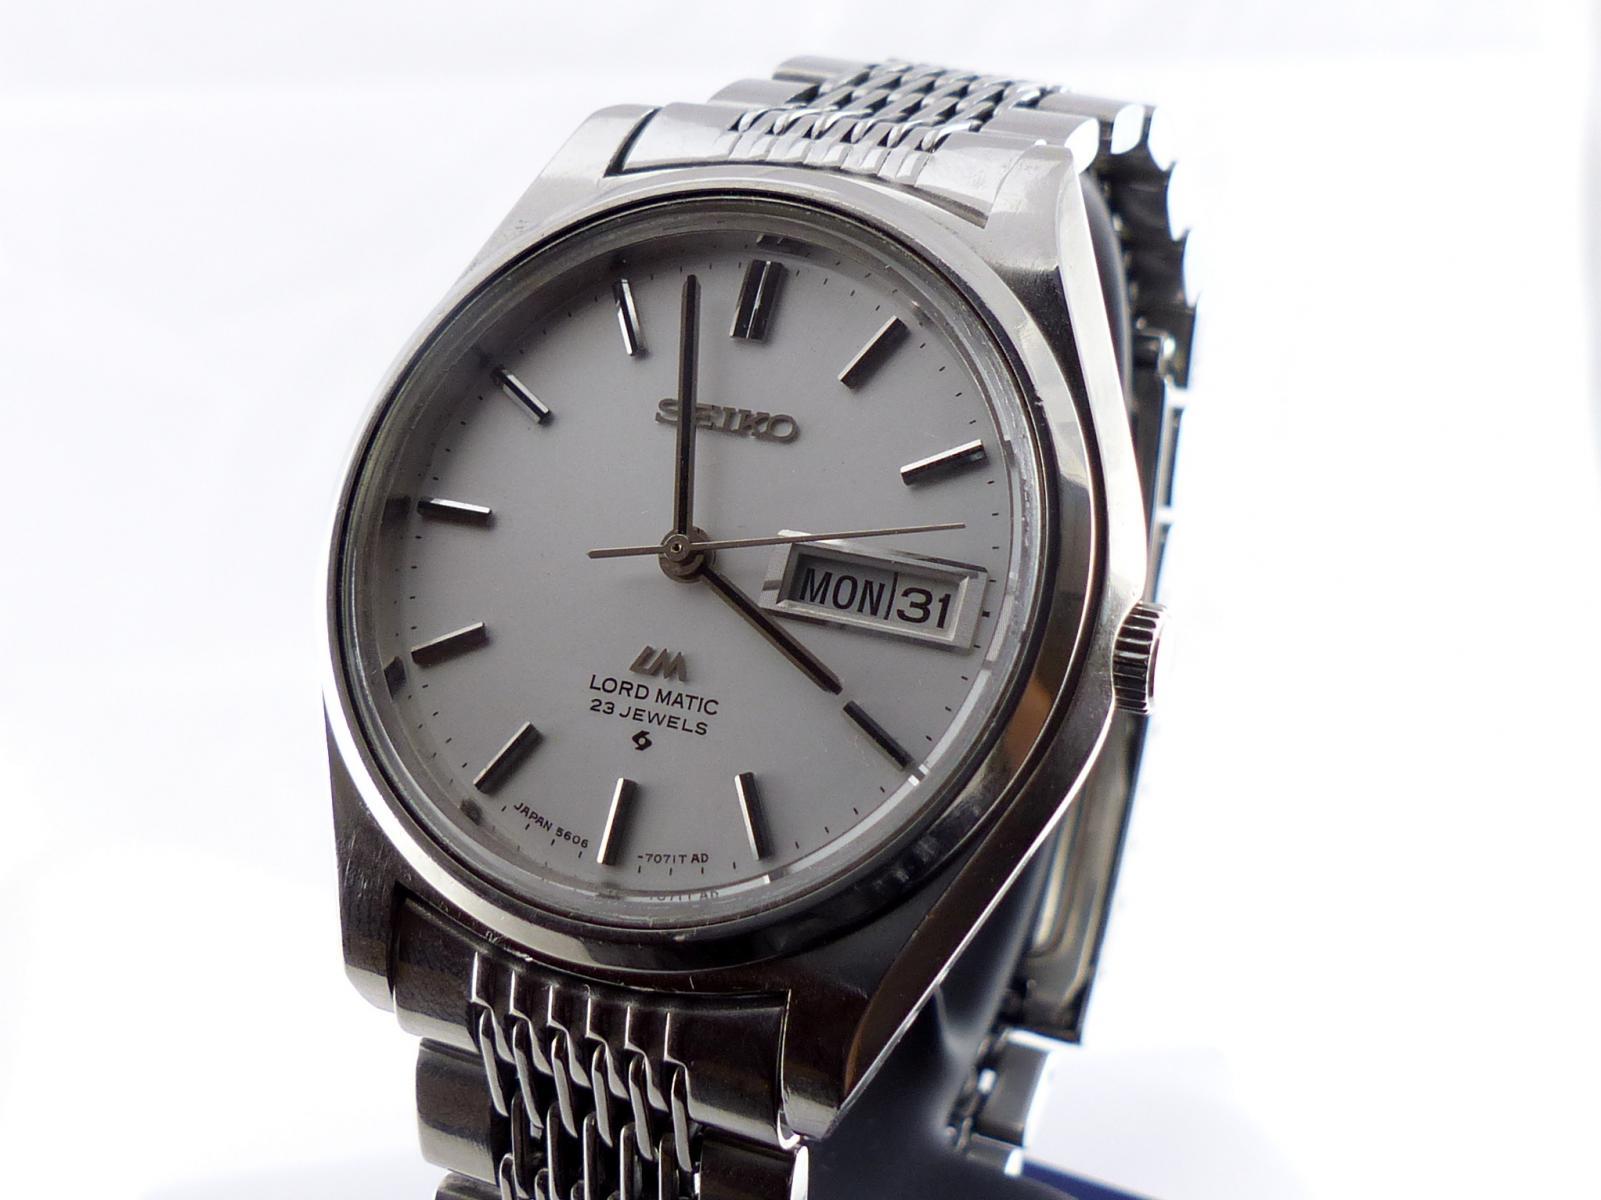 My Birthday Watch - 5606-p4860561.jpg